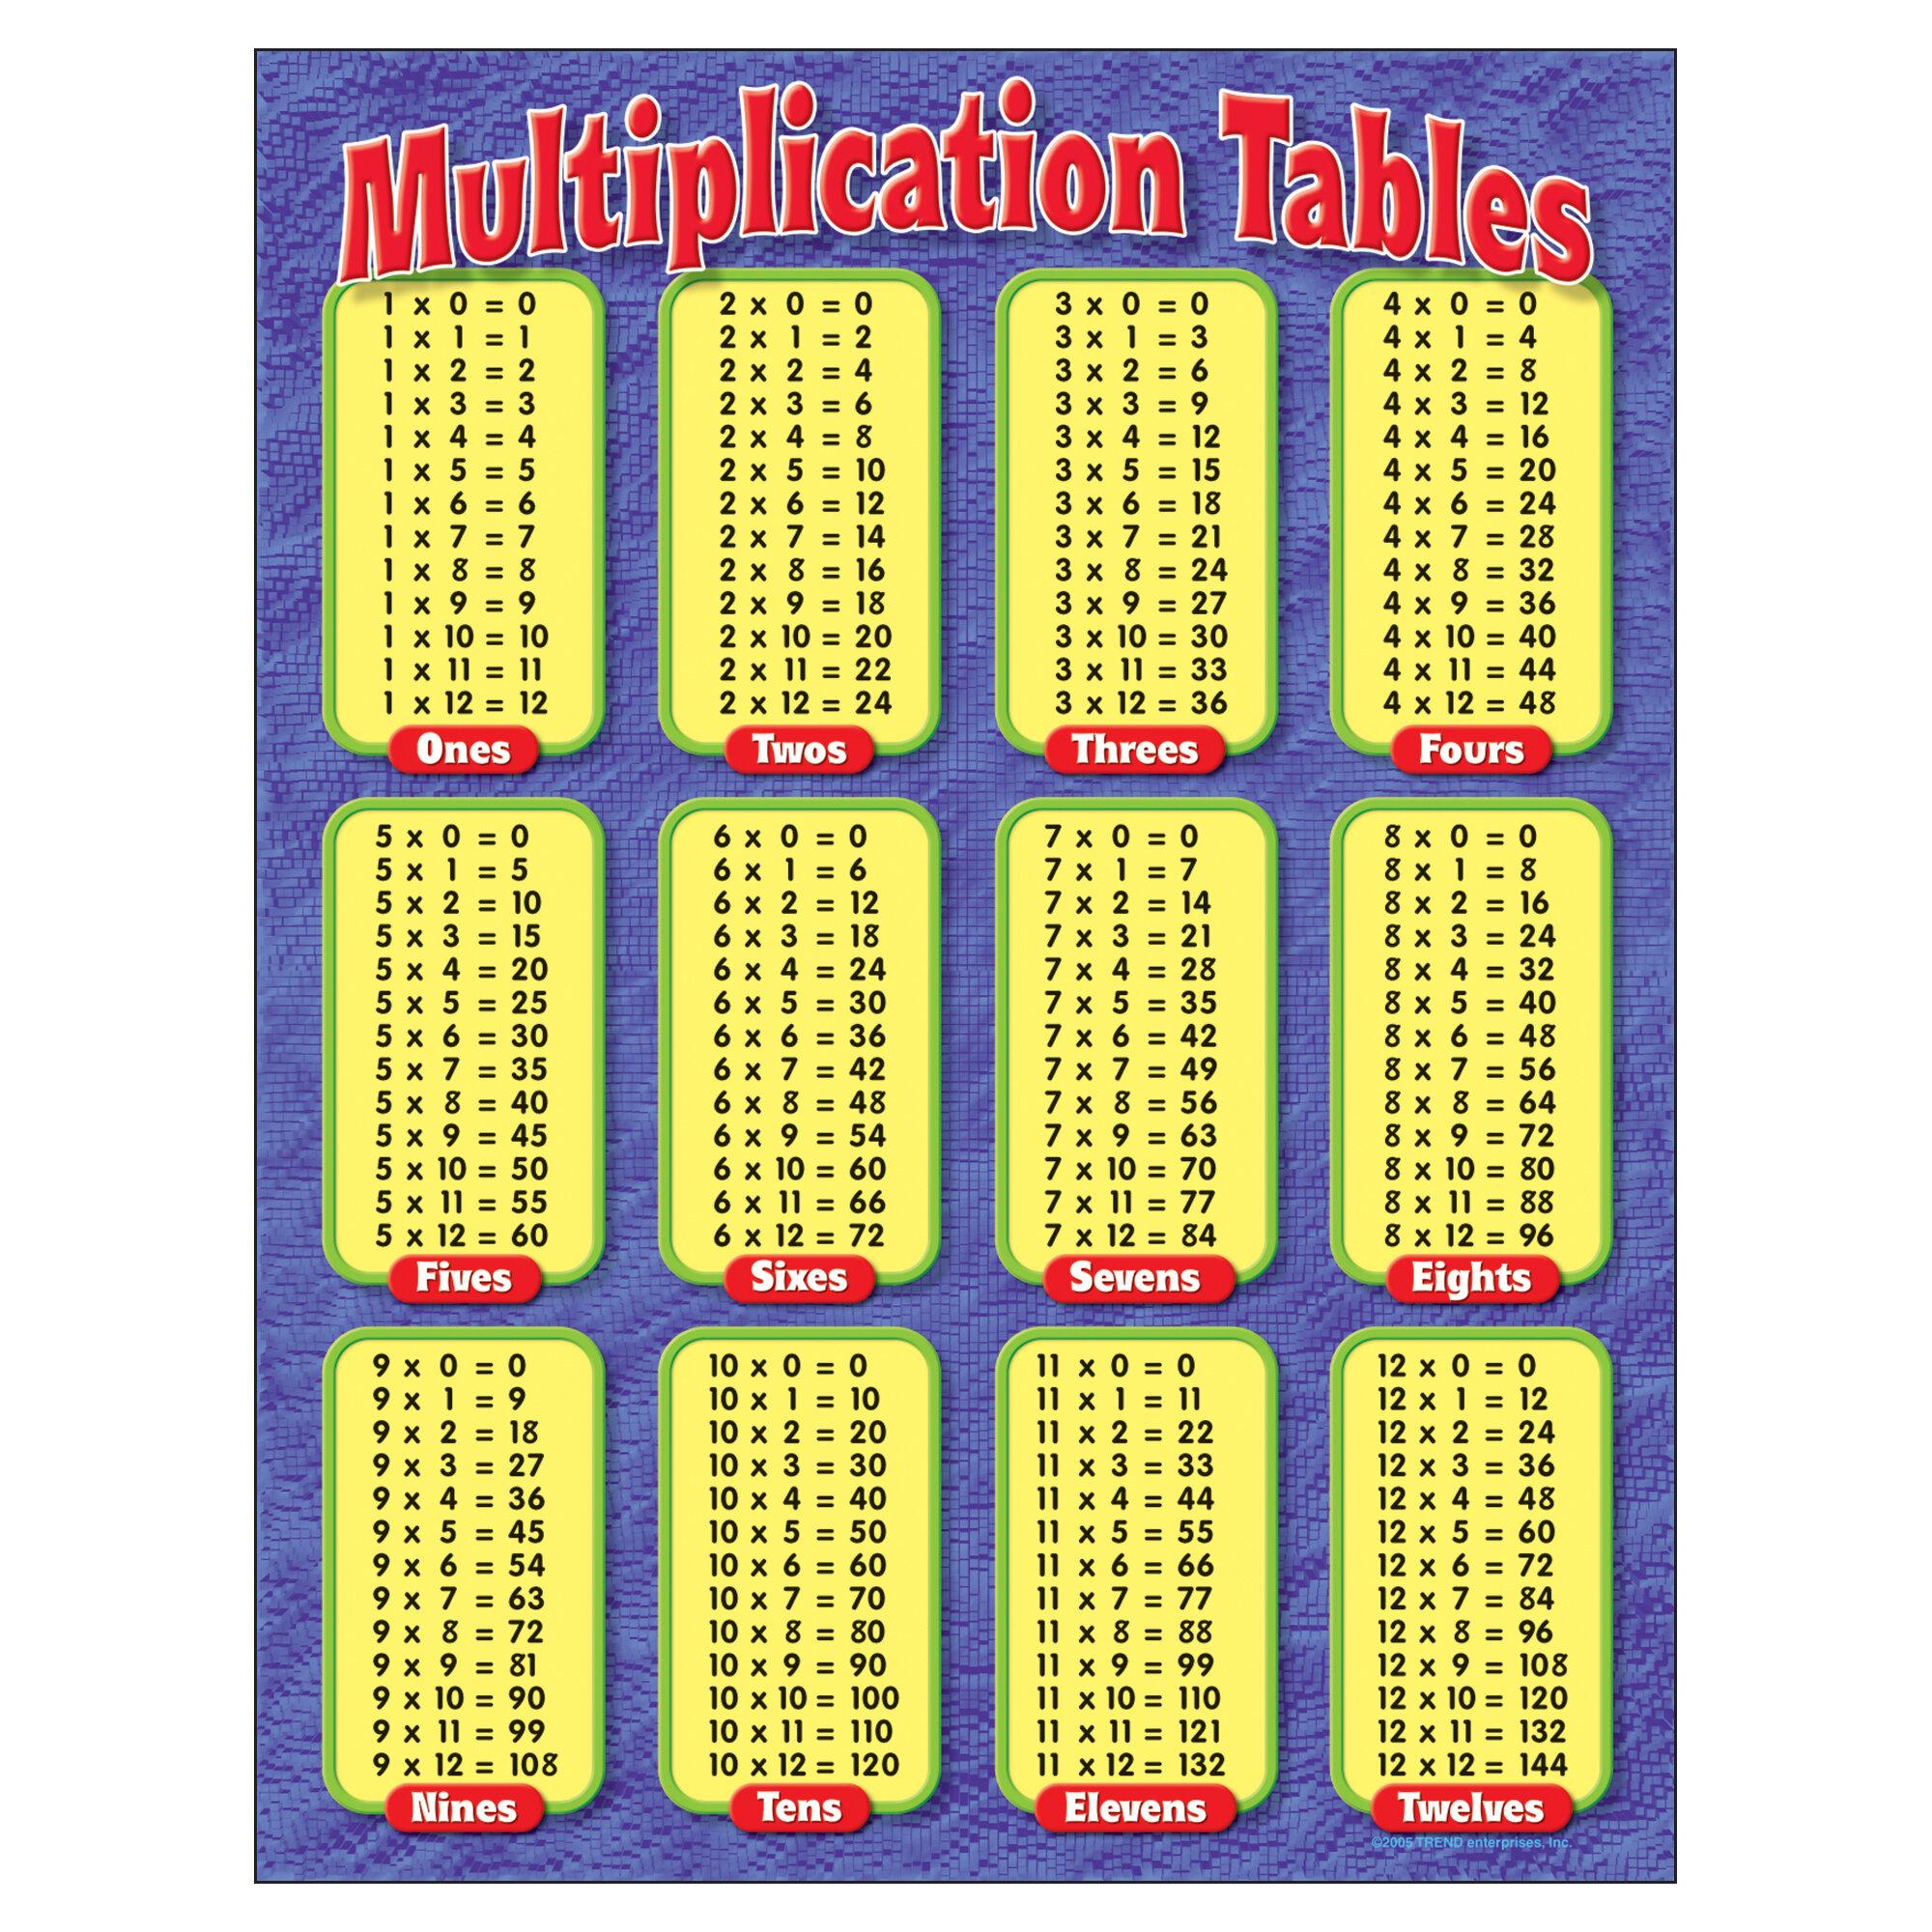 Multiplication Table Chart 11 To 20 - Vatan.vtngcf pertaining to Printable Multiplication Table 0-10